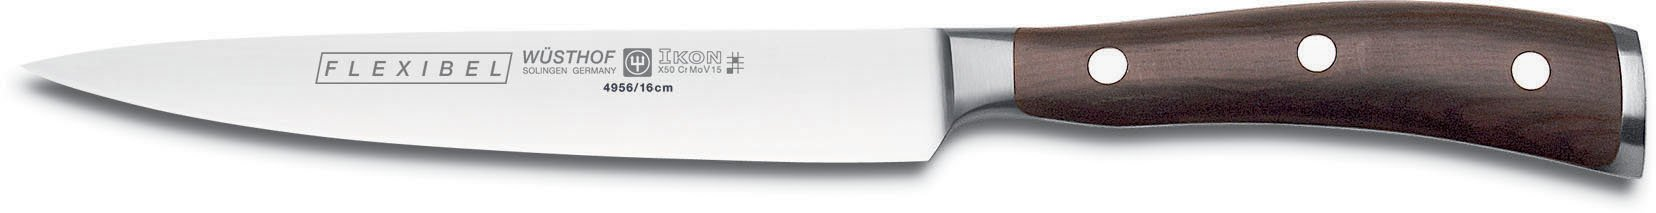 Wusthof Ikon 6-Inch Flexible Fillet Knife with Blackwood Handle